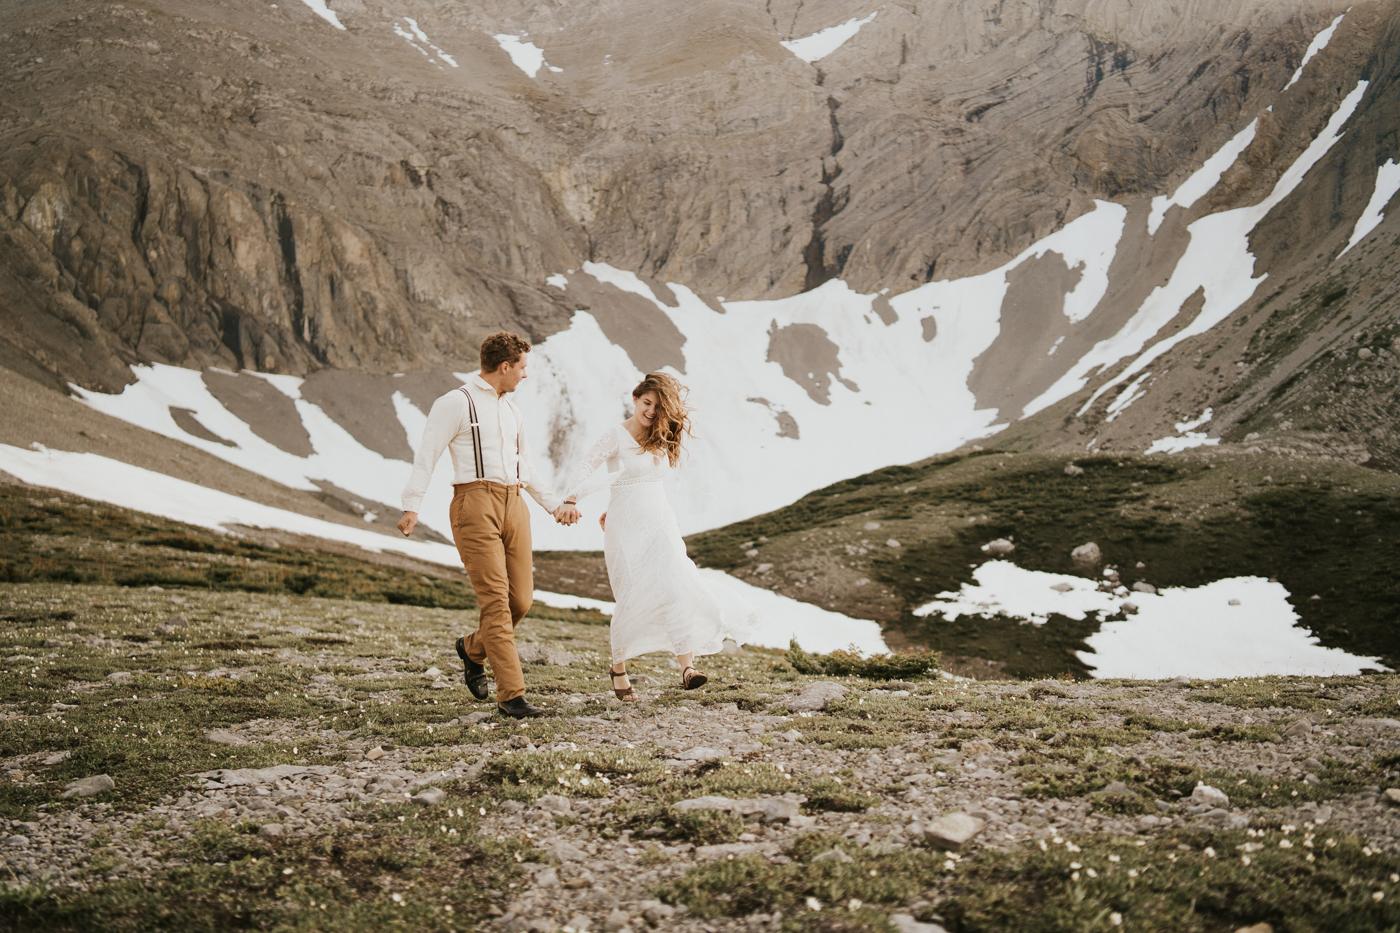 tyraephotography_photographer_wedding_elopement_engagement_photography-08092.jpg